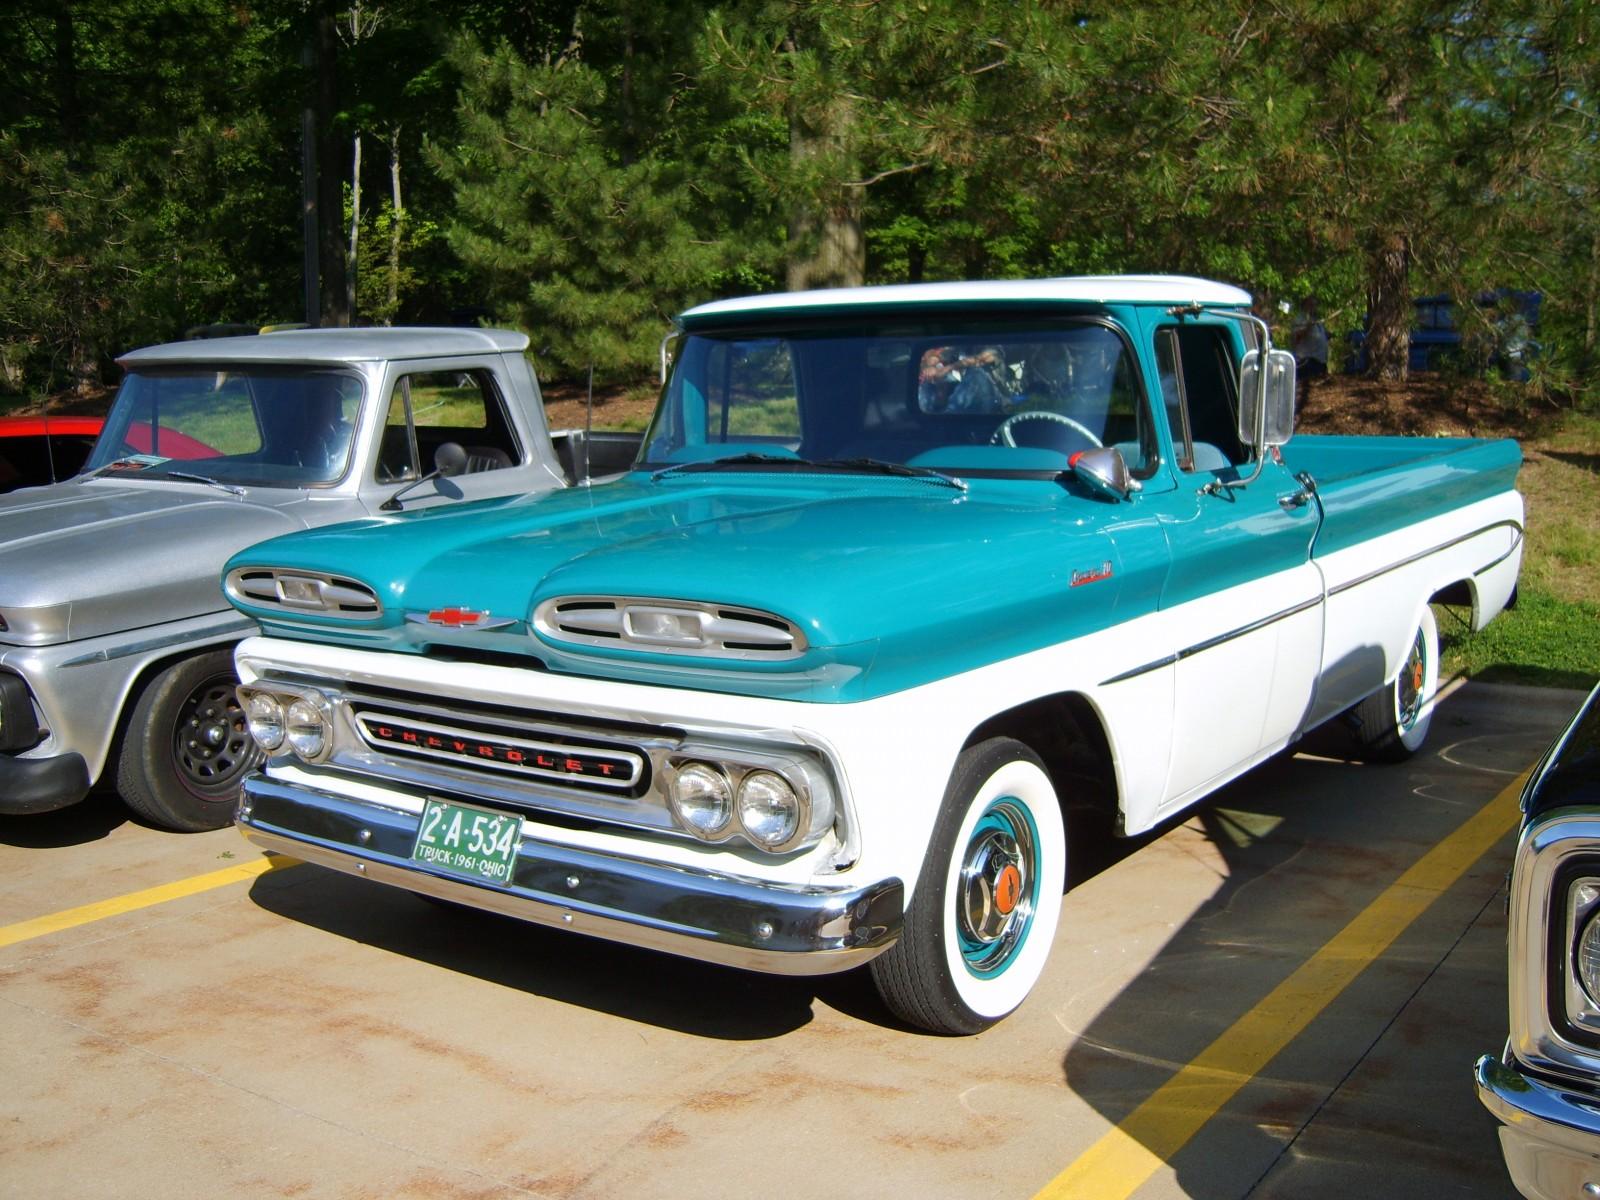 Super Summit Truck Stop Gallery Of Trucks Onallcylinders 1961 Chevy Pickup